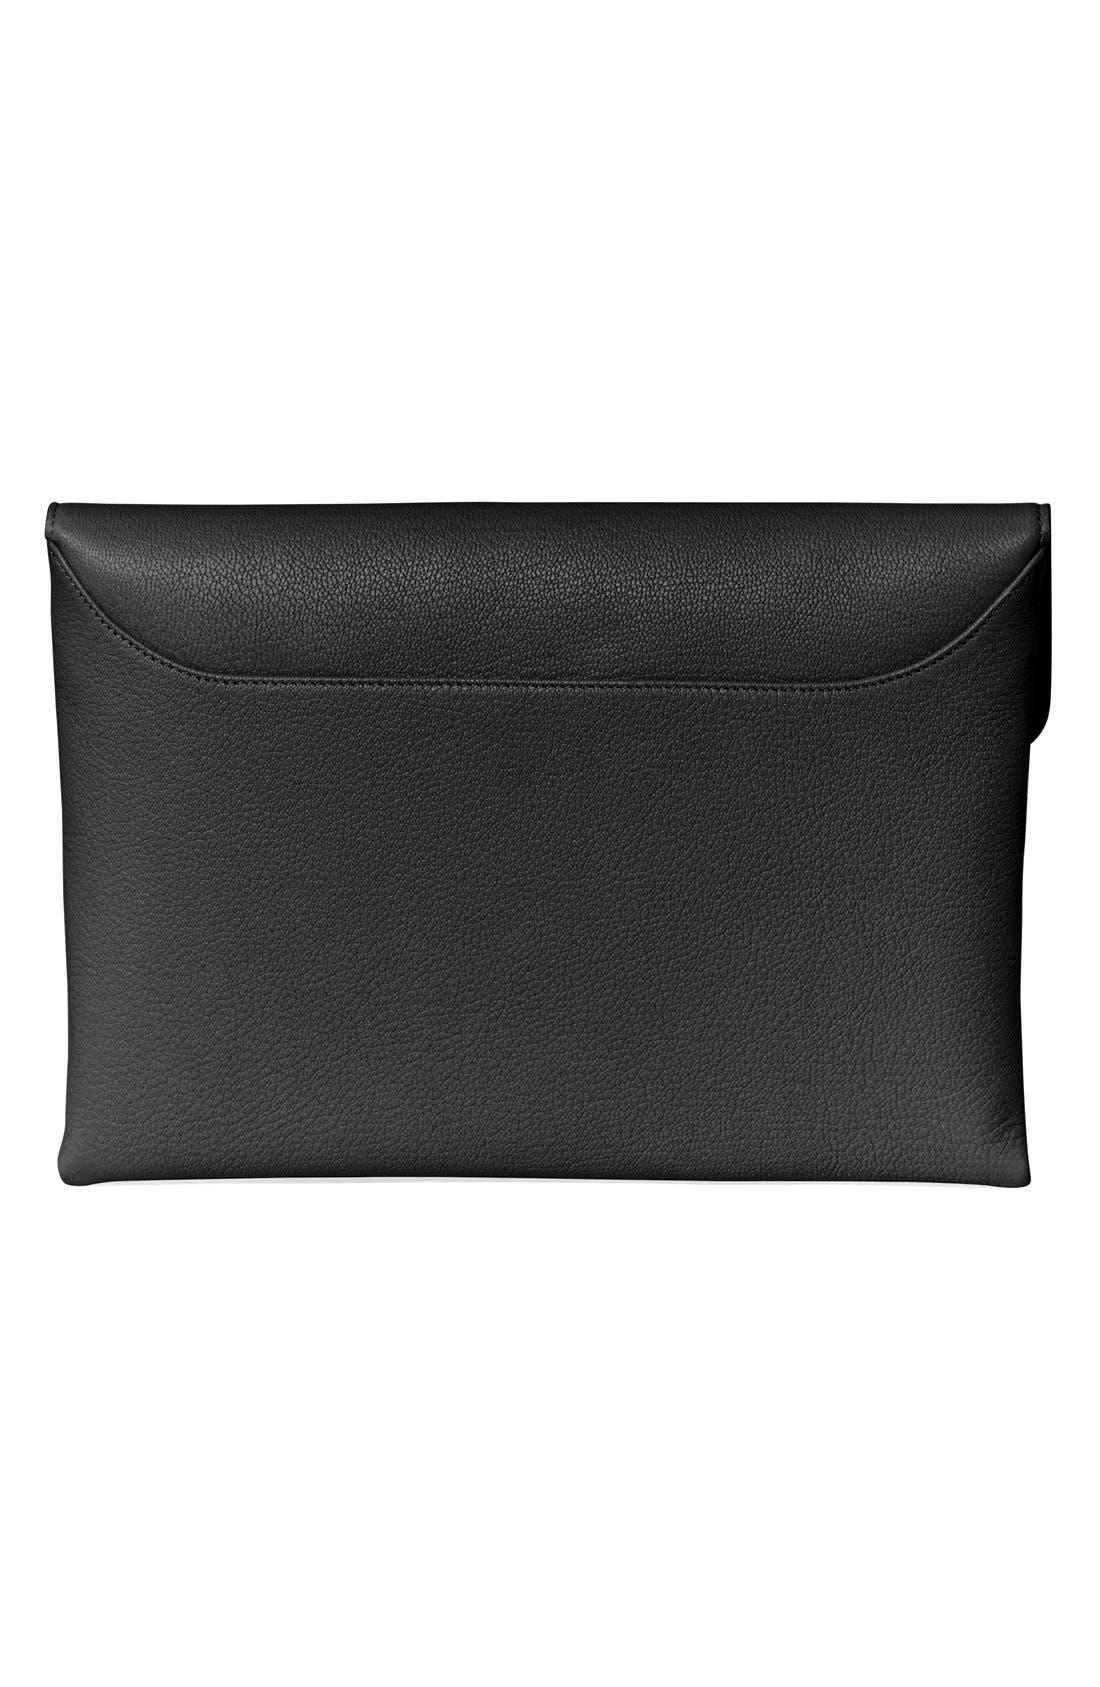 Alternate Image 2  - Givenchy 'Medium Antigona' Leather Envelope Clutch